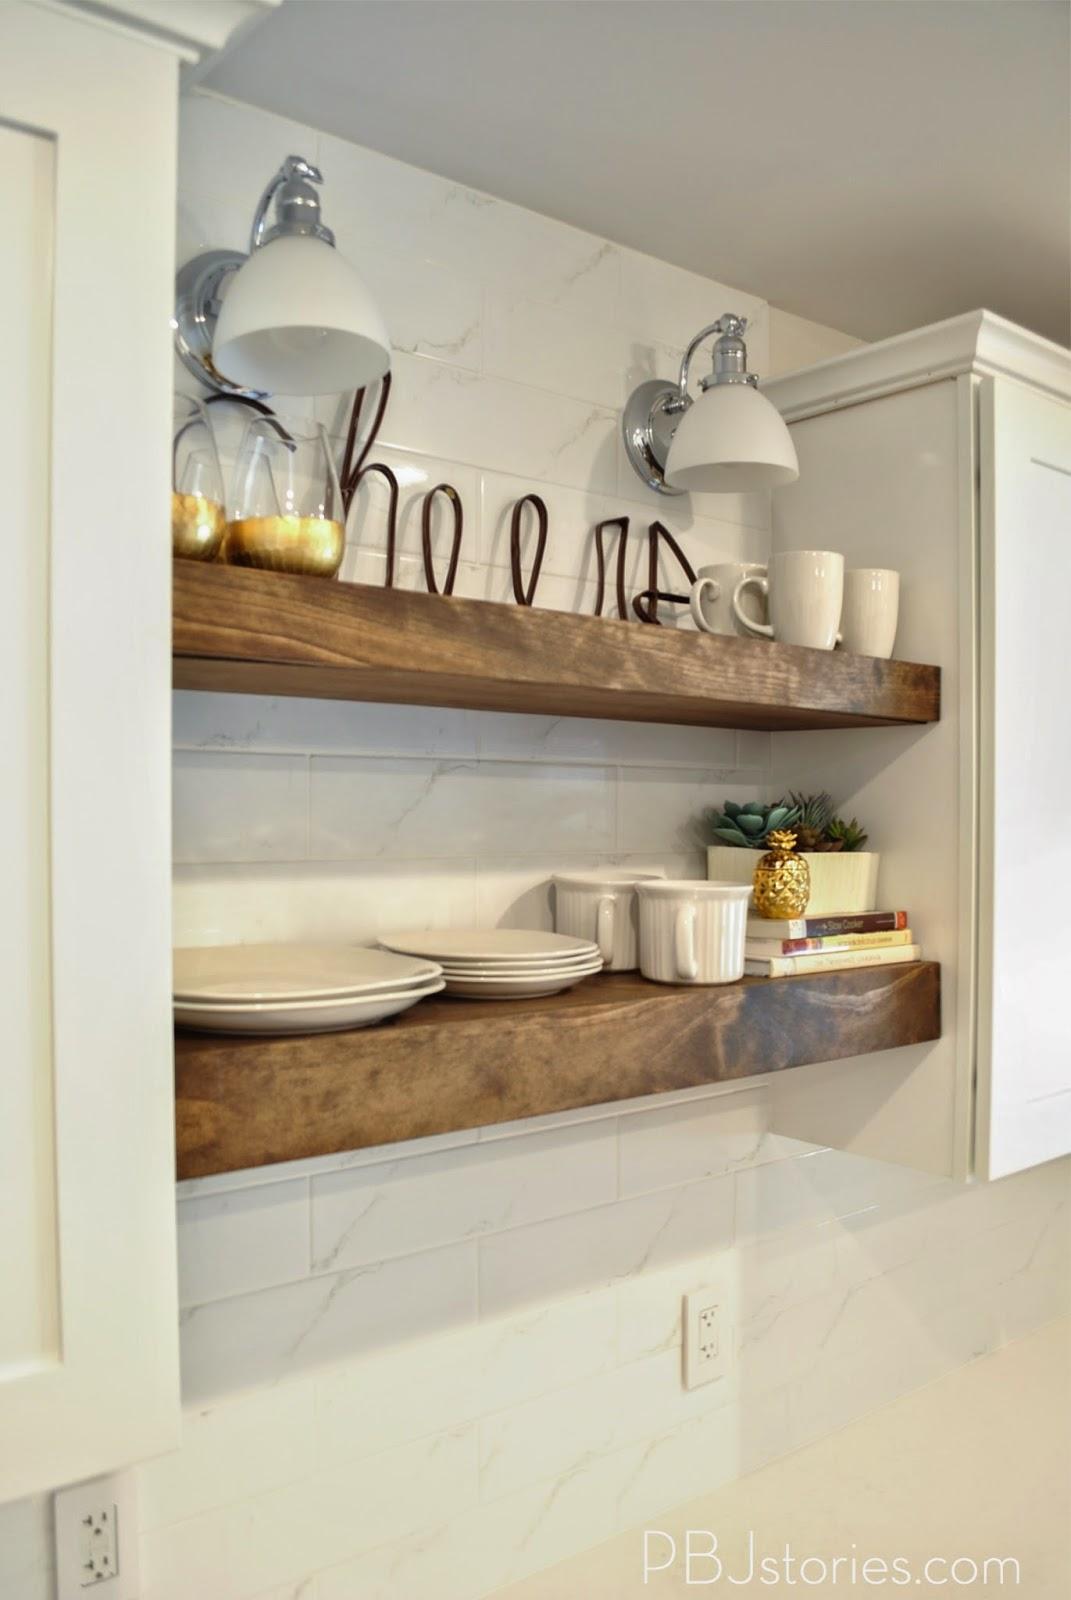 PBJstories: Our DIY Open Kitchen Shelves | #PBJreno